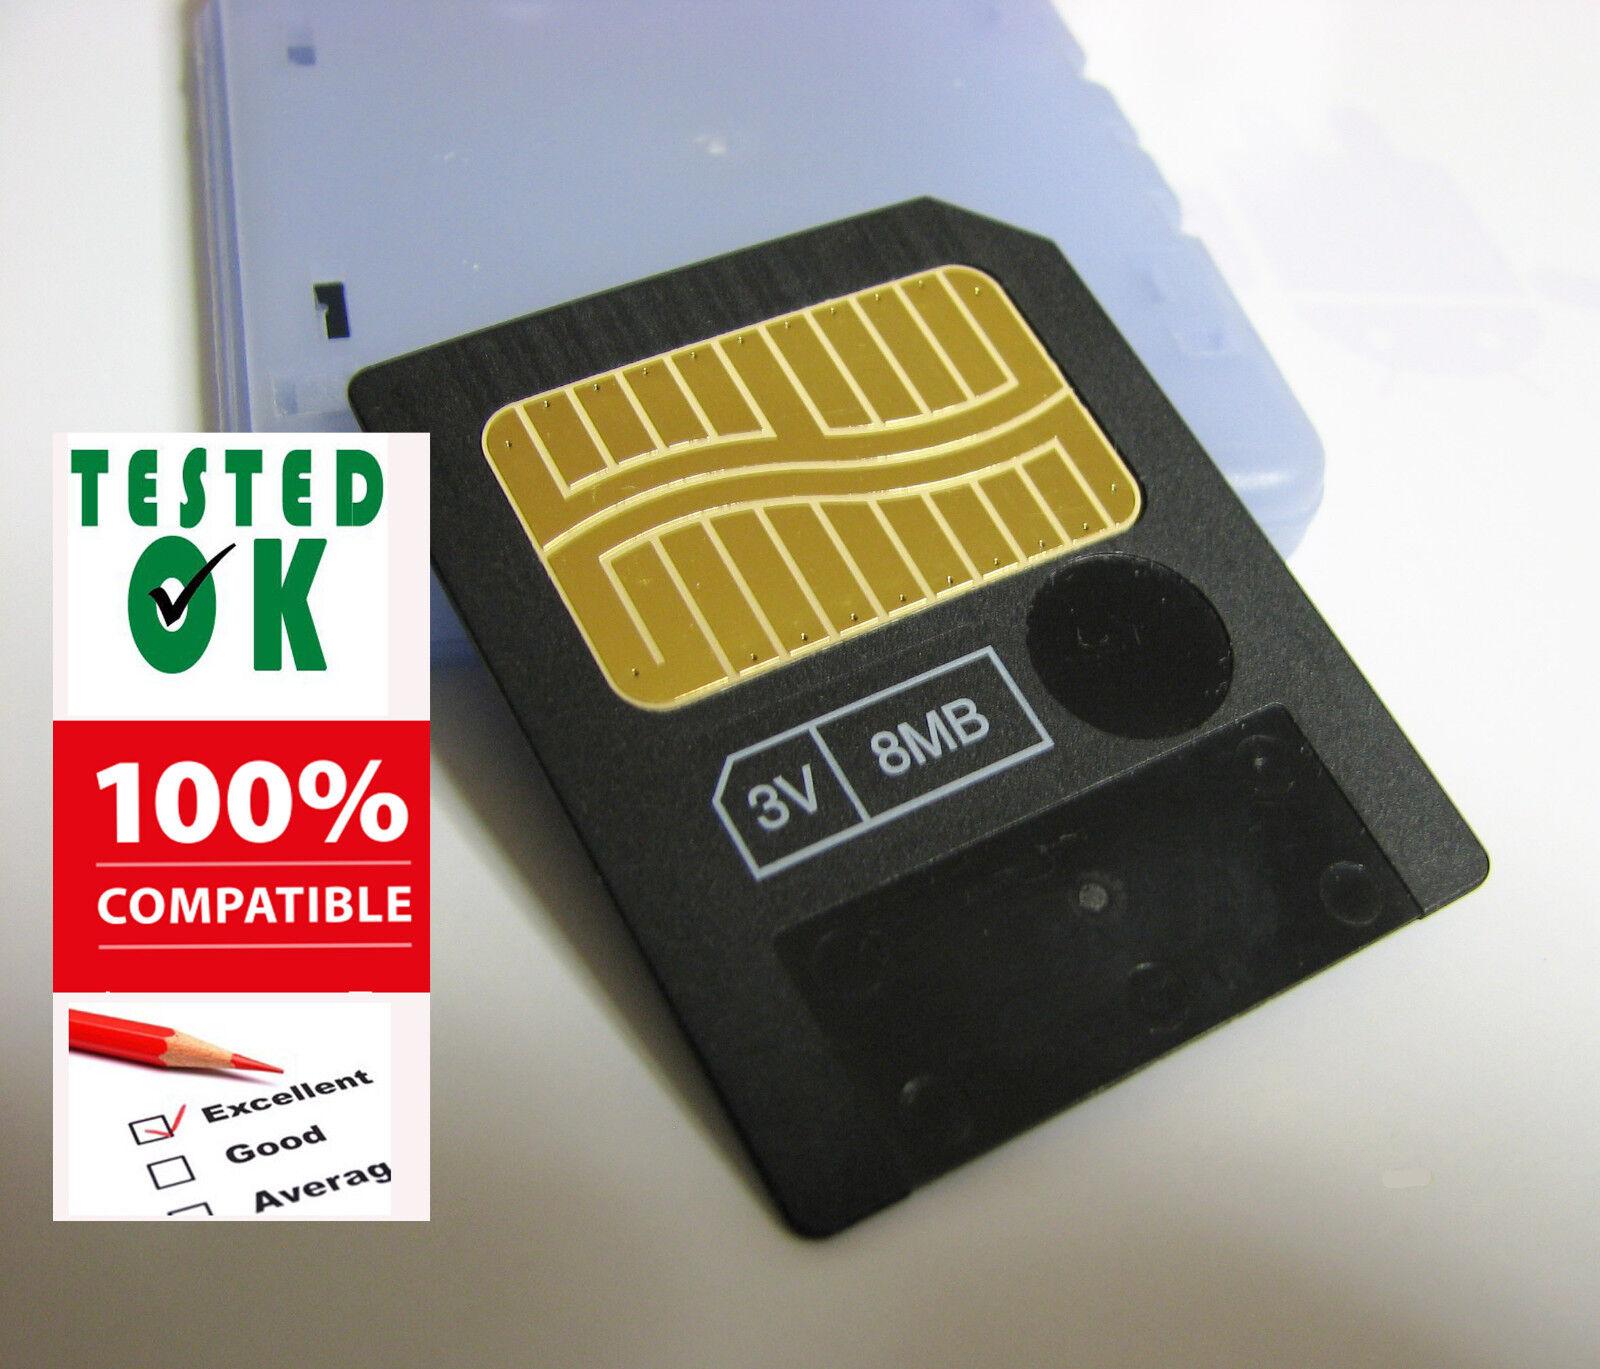 8 MB SMARTMEDIA CARD-Memoria Musicale Tastiere Campionatori MP3 Foto KORG Yamaha